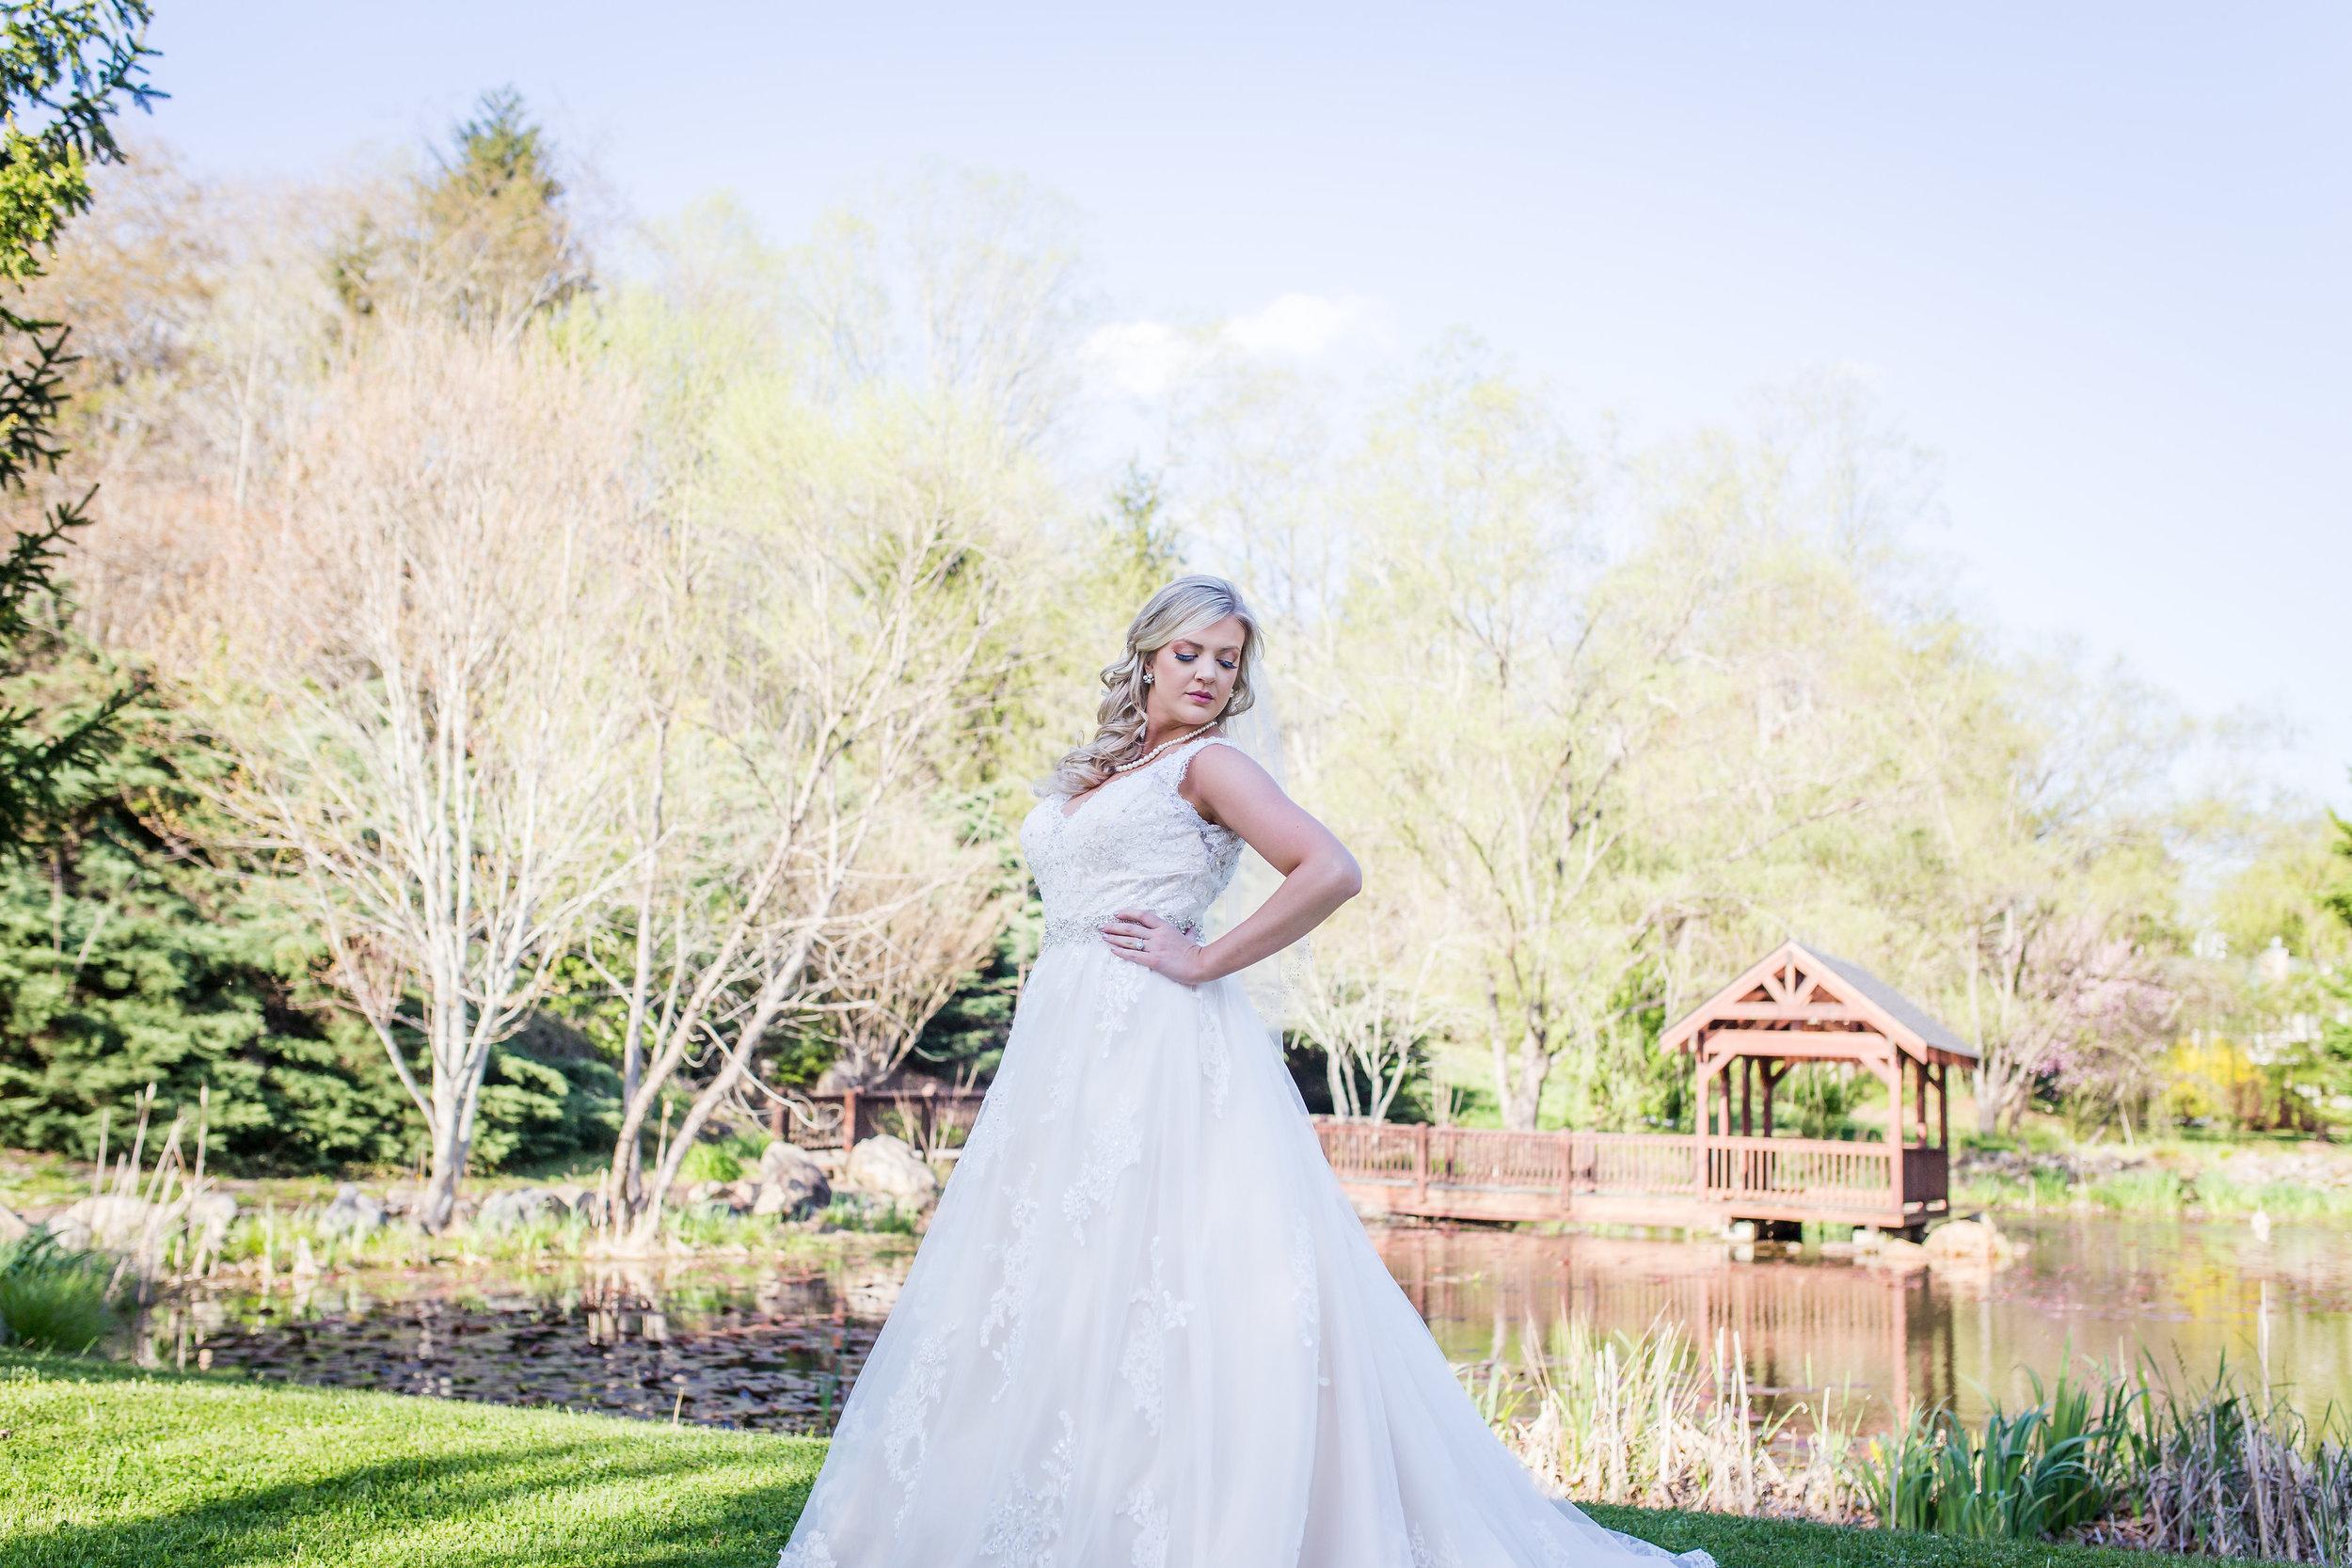 Honeysuckle-Hill-Asheville-Wedding-Venue-Ann-Cordell-Bridal-124.JPG